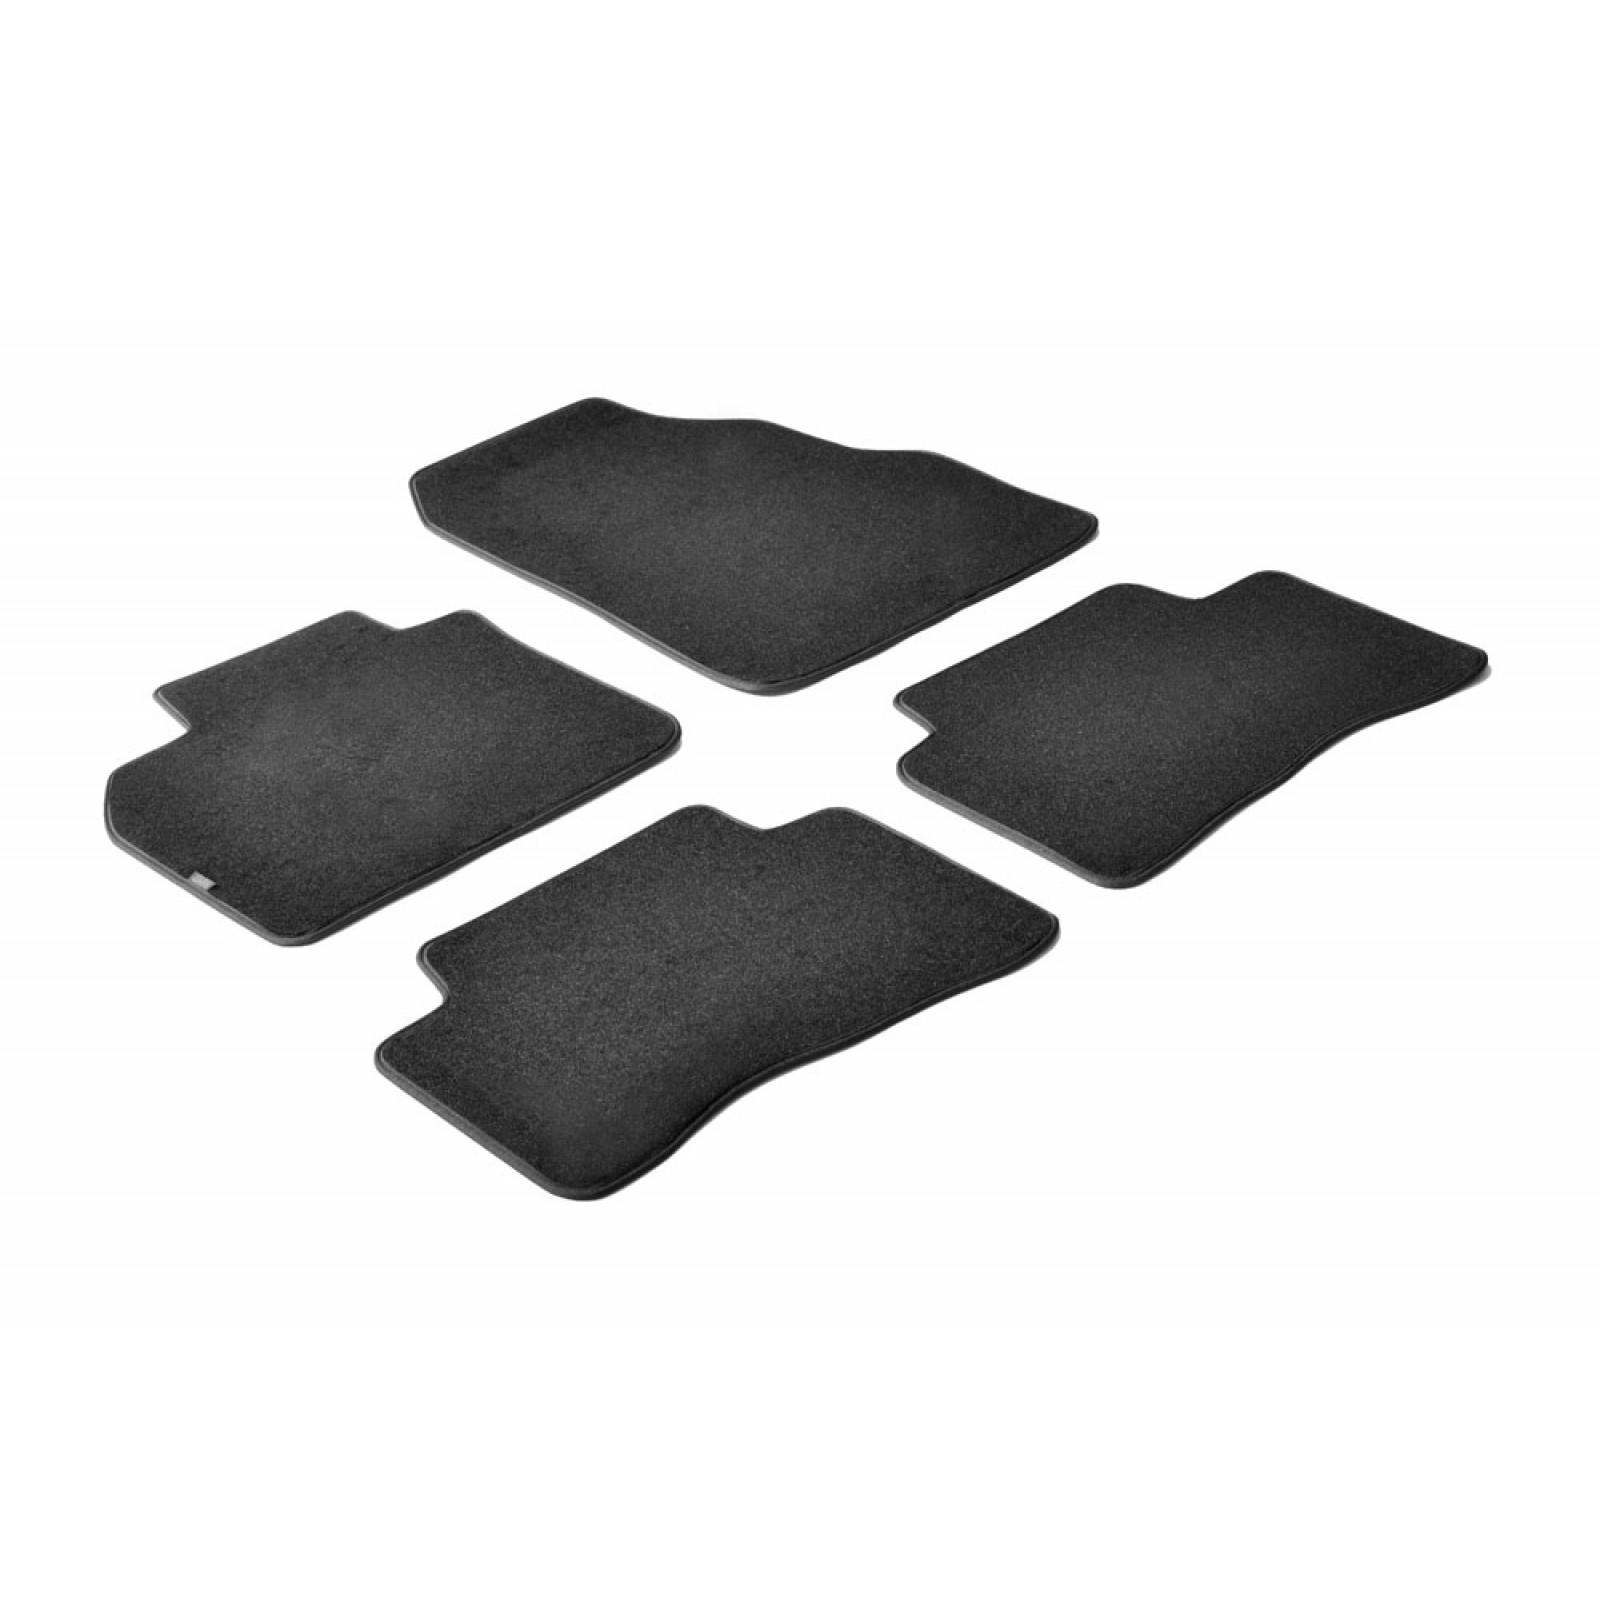 tapis en textile pour renault scenic. Black Bedroom Furniture Sets. Home Design Ideas